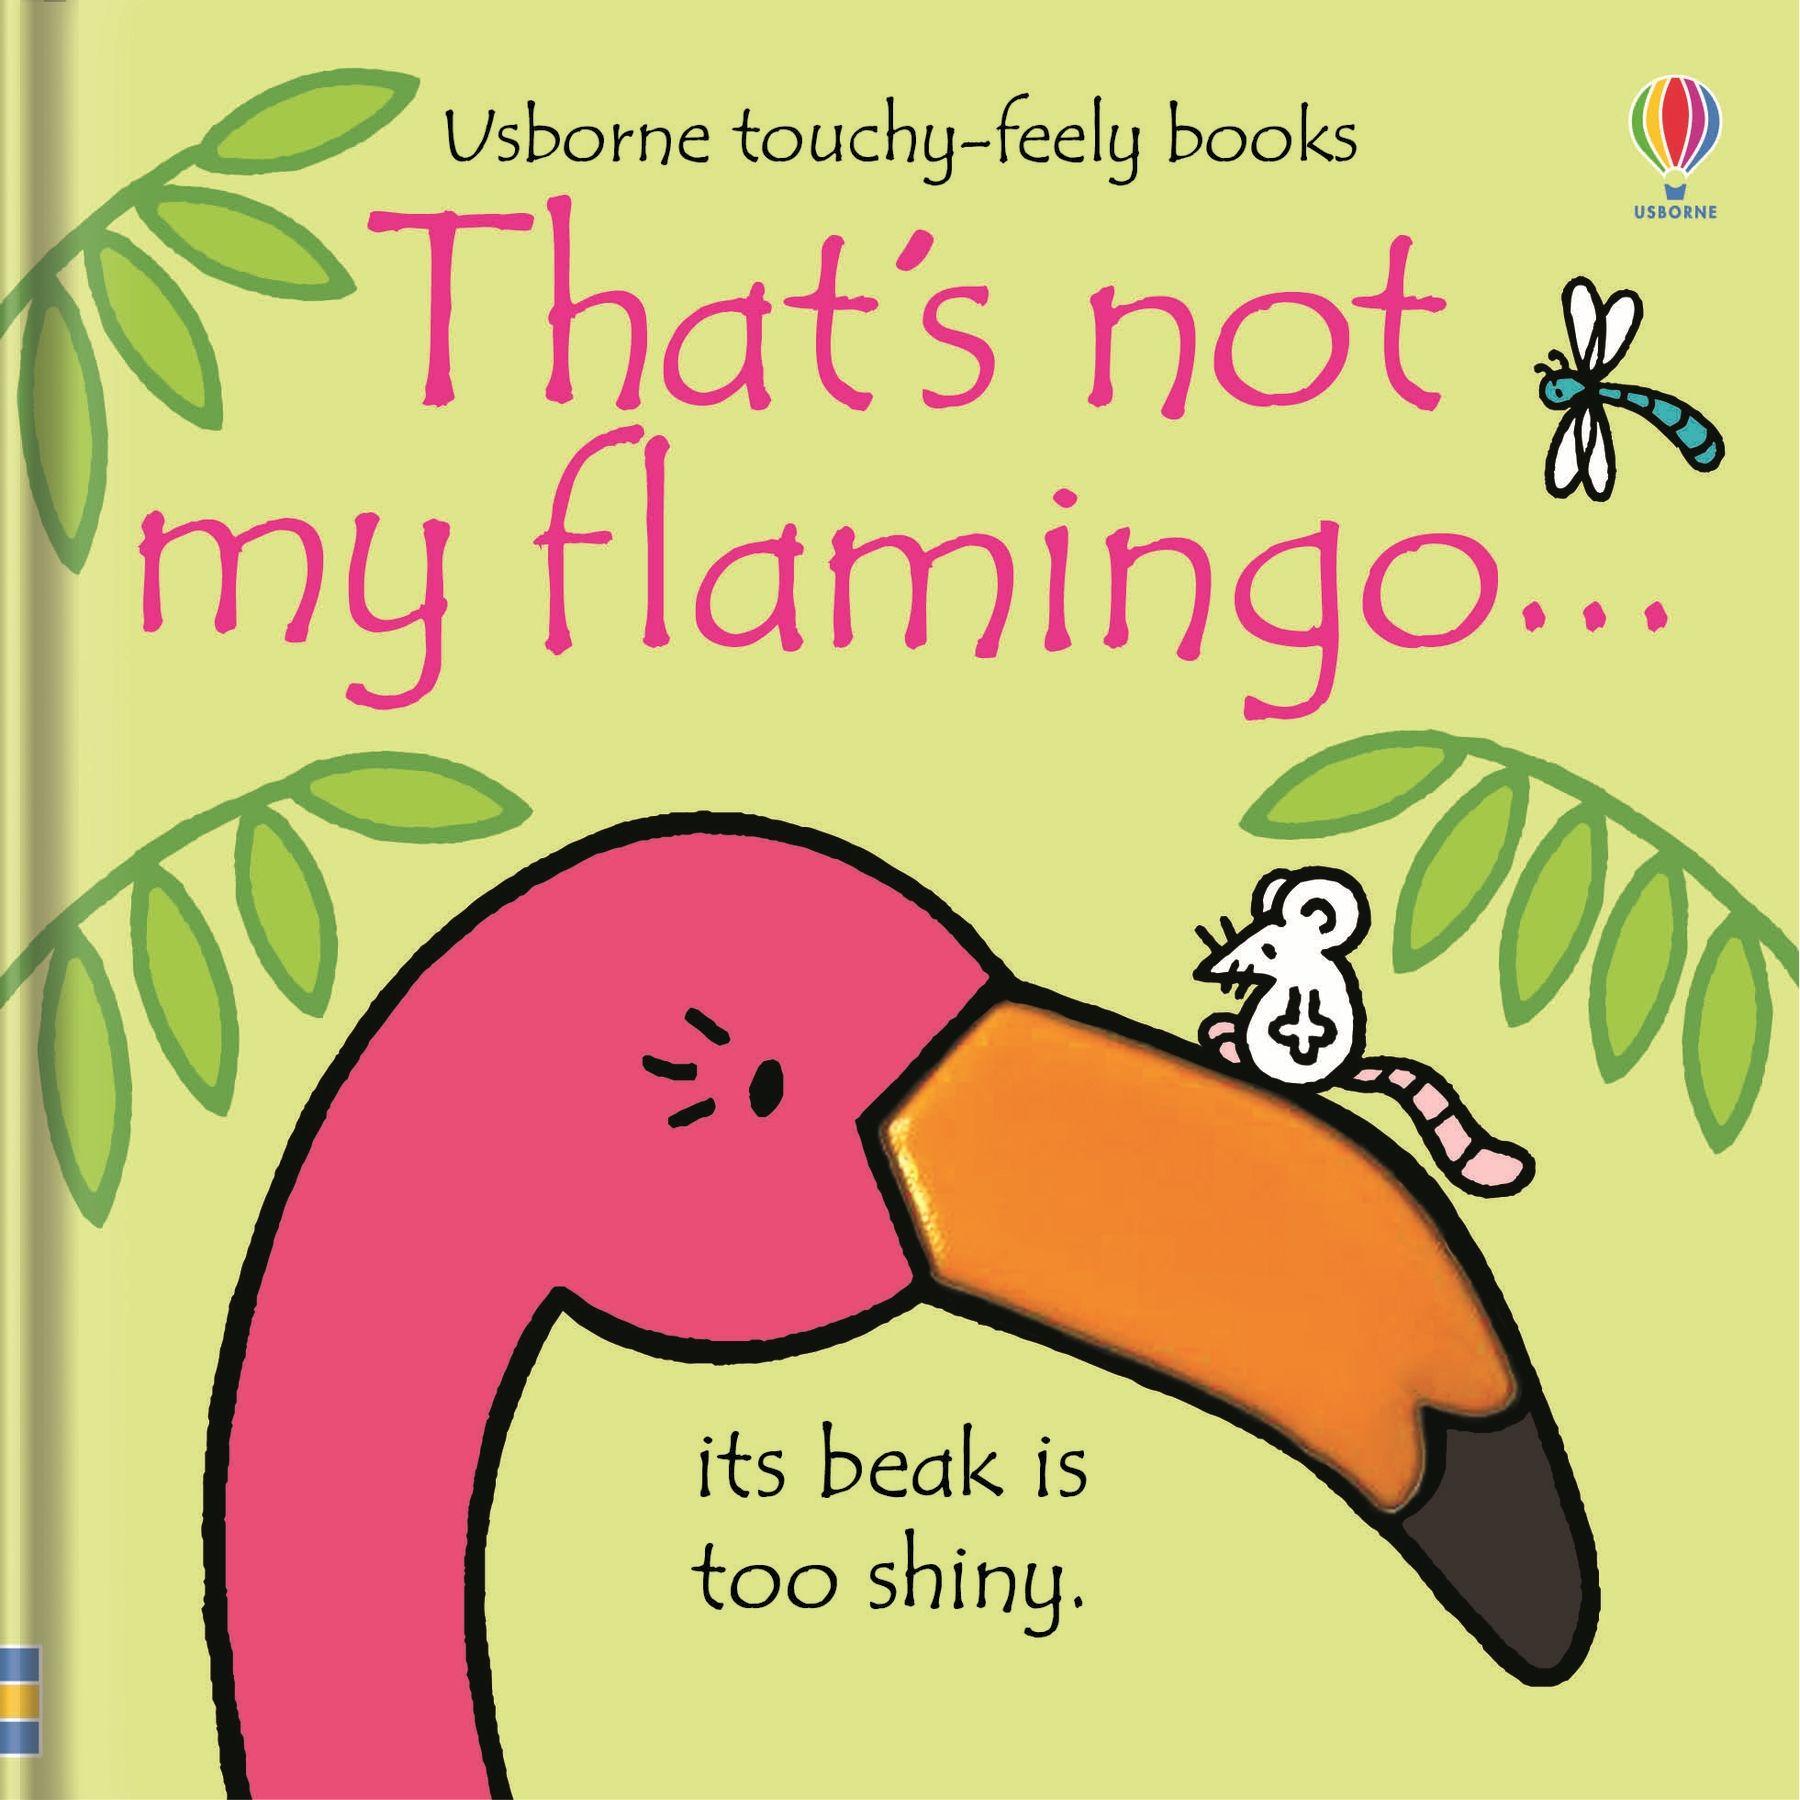 That's Not My Flamingo Image